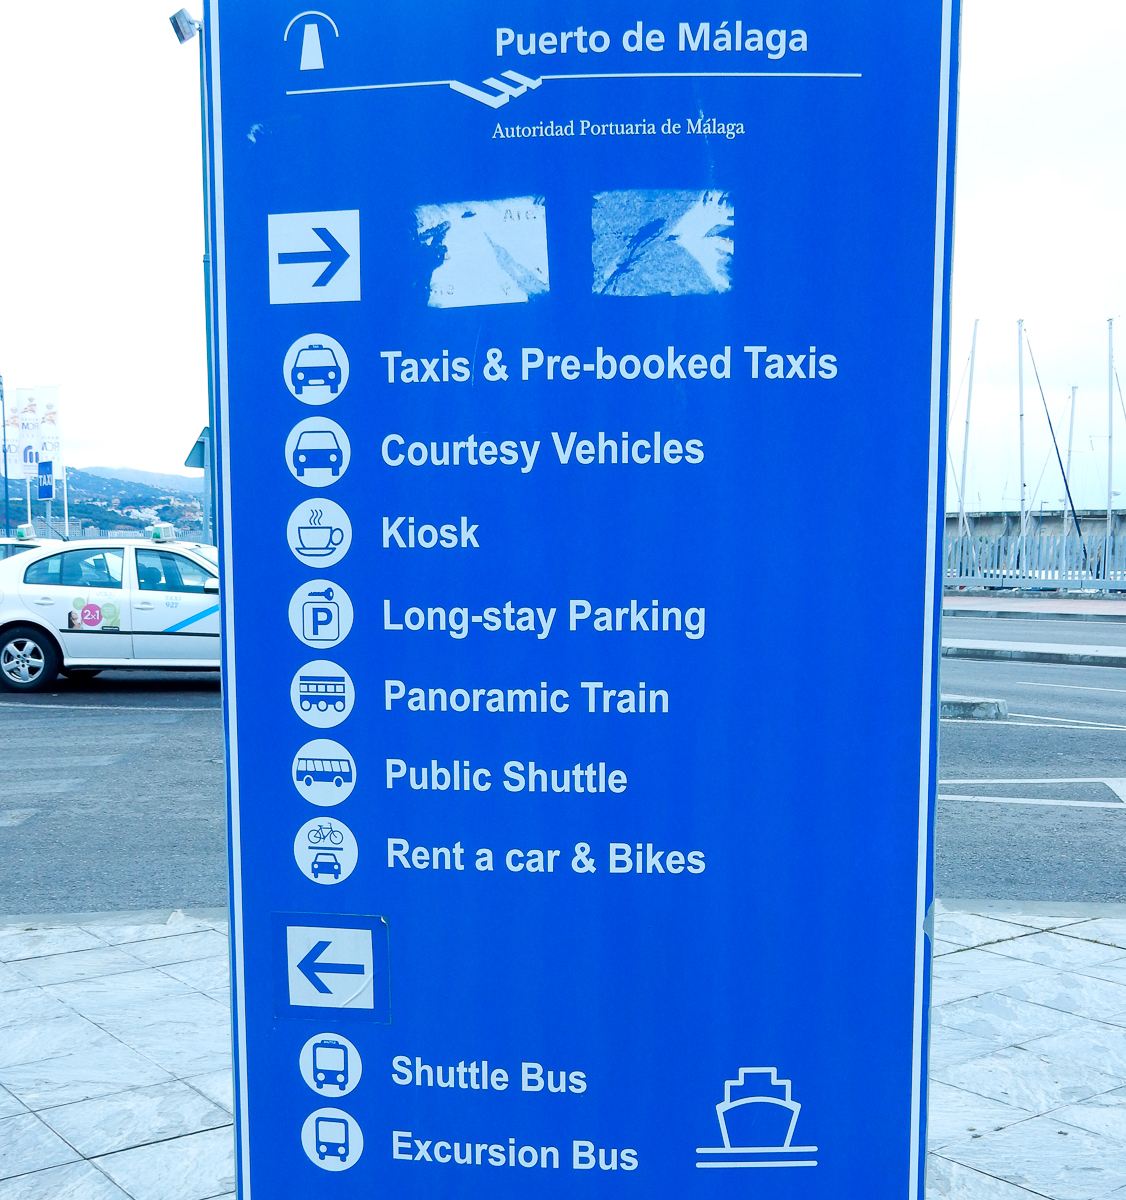 Hinweise am Kreuzfahrtterminal in Malaga